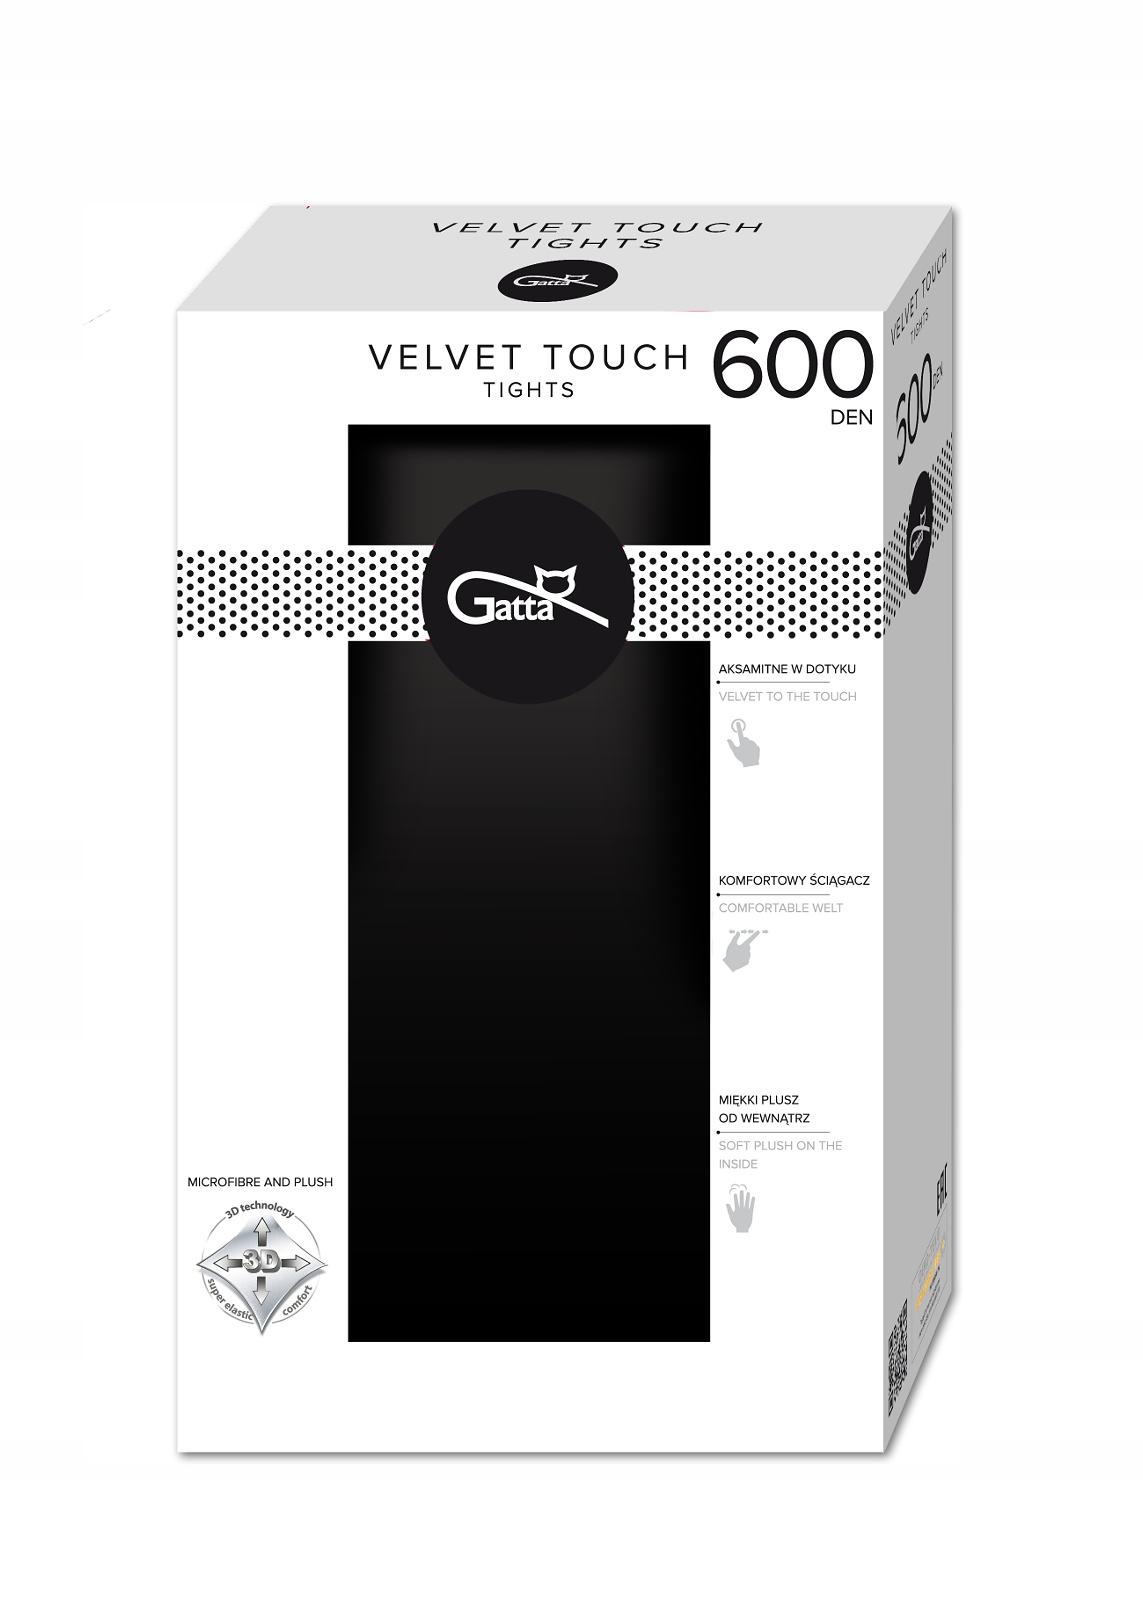 Gatta Velvet Touch rajstopy plusz 600den nero r.4